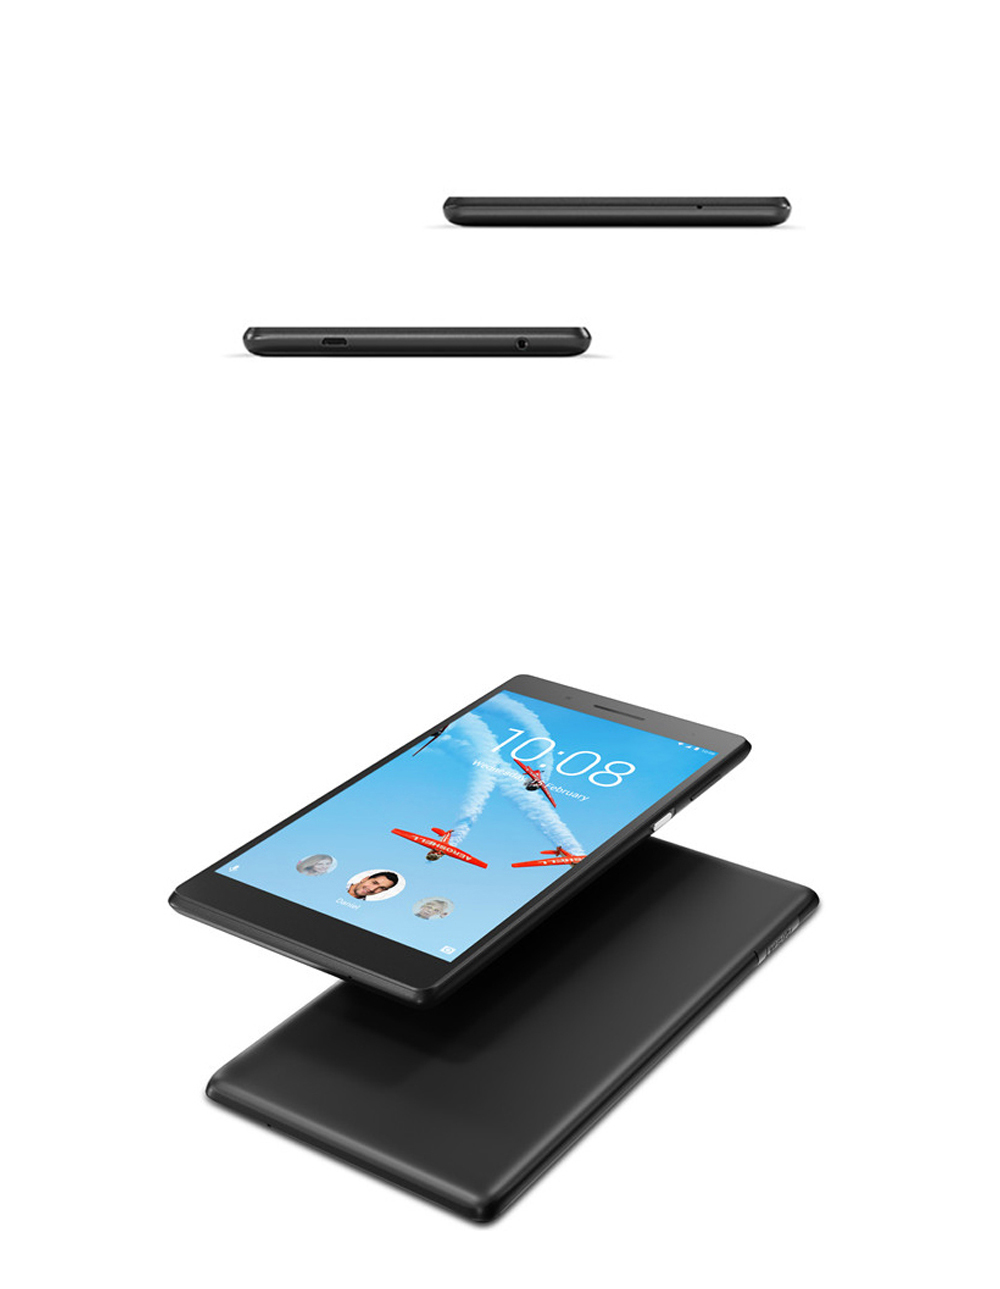 Global Lenovo TAB 7 Essential TB-7304N Android7 0 MT8735D Quad-Core 1 3GHz  64B 1G+16G LTE 7 0 Inch Dual SIM 3450mAh Smart Phone